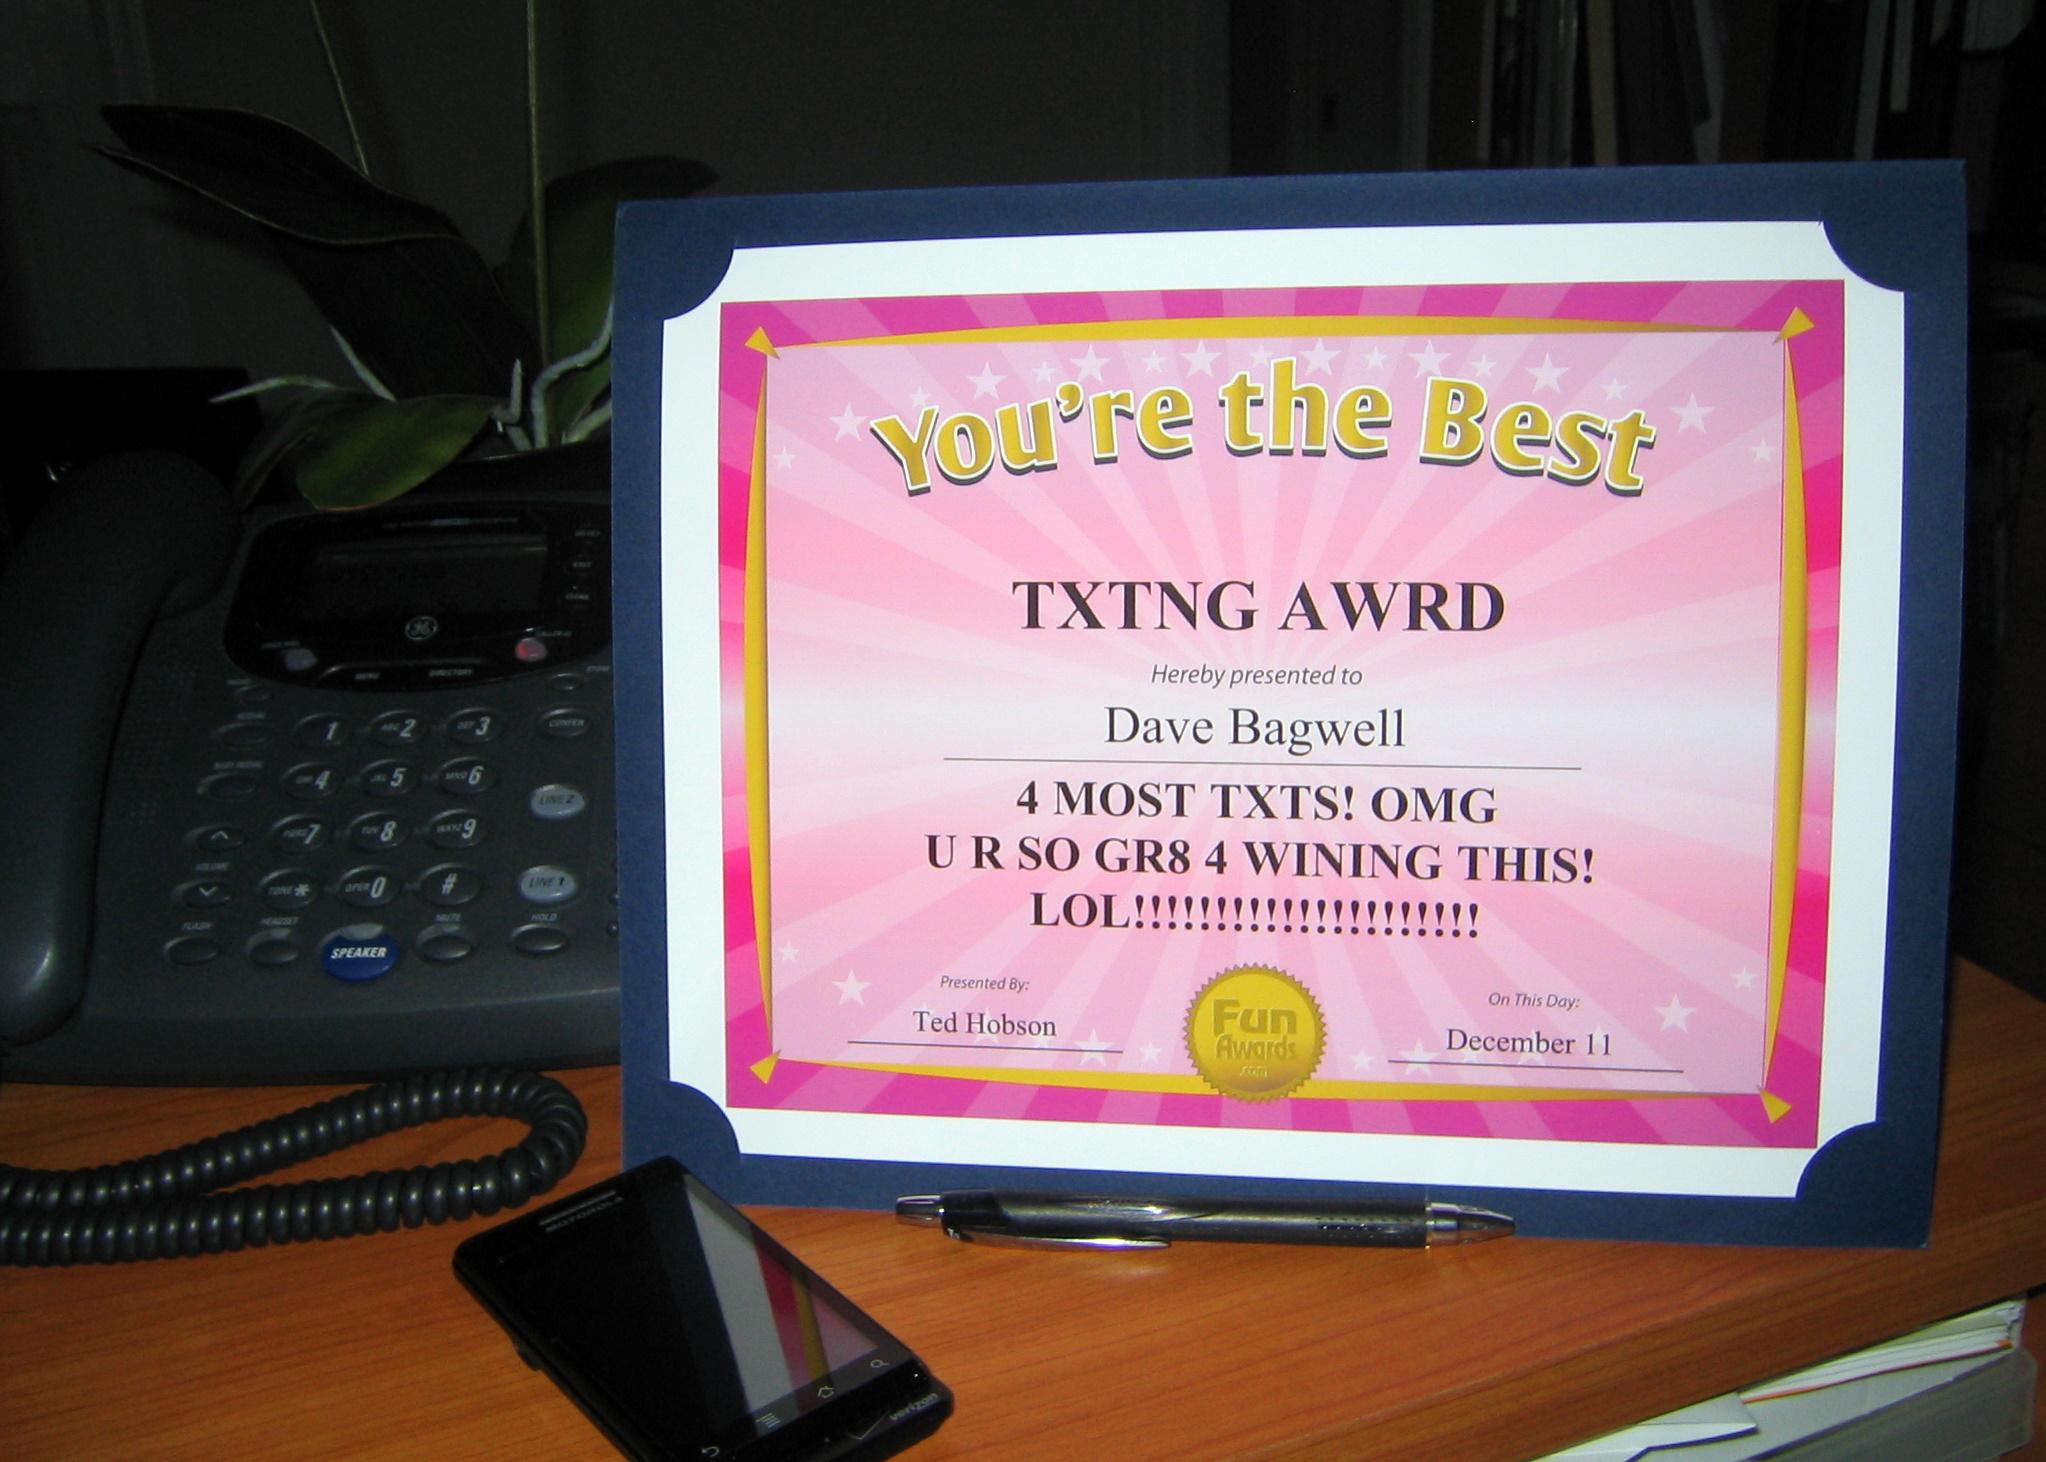 funny staff awards  u2013 fun awards announces sale to rescue